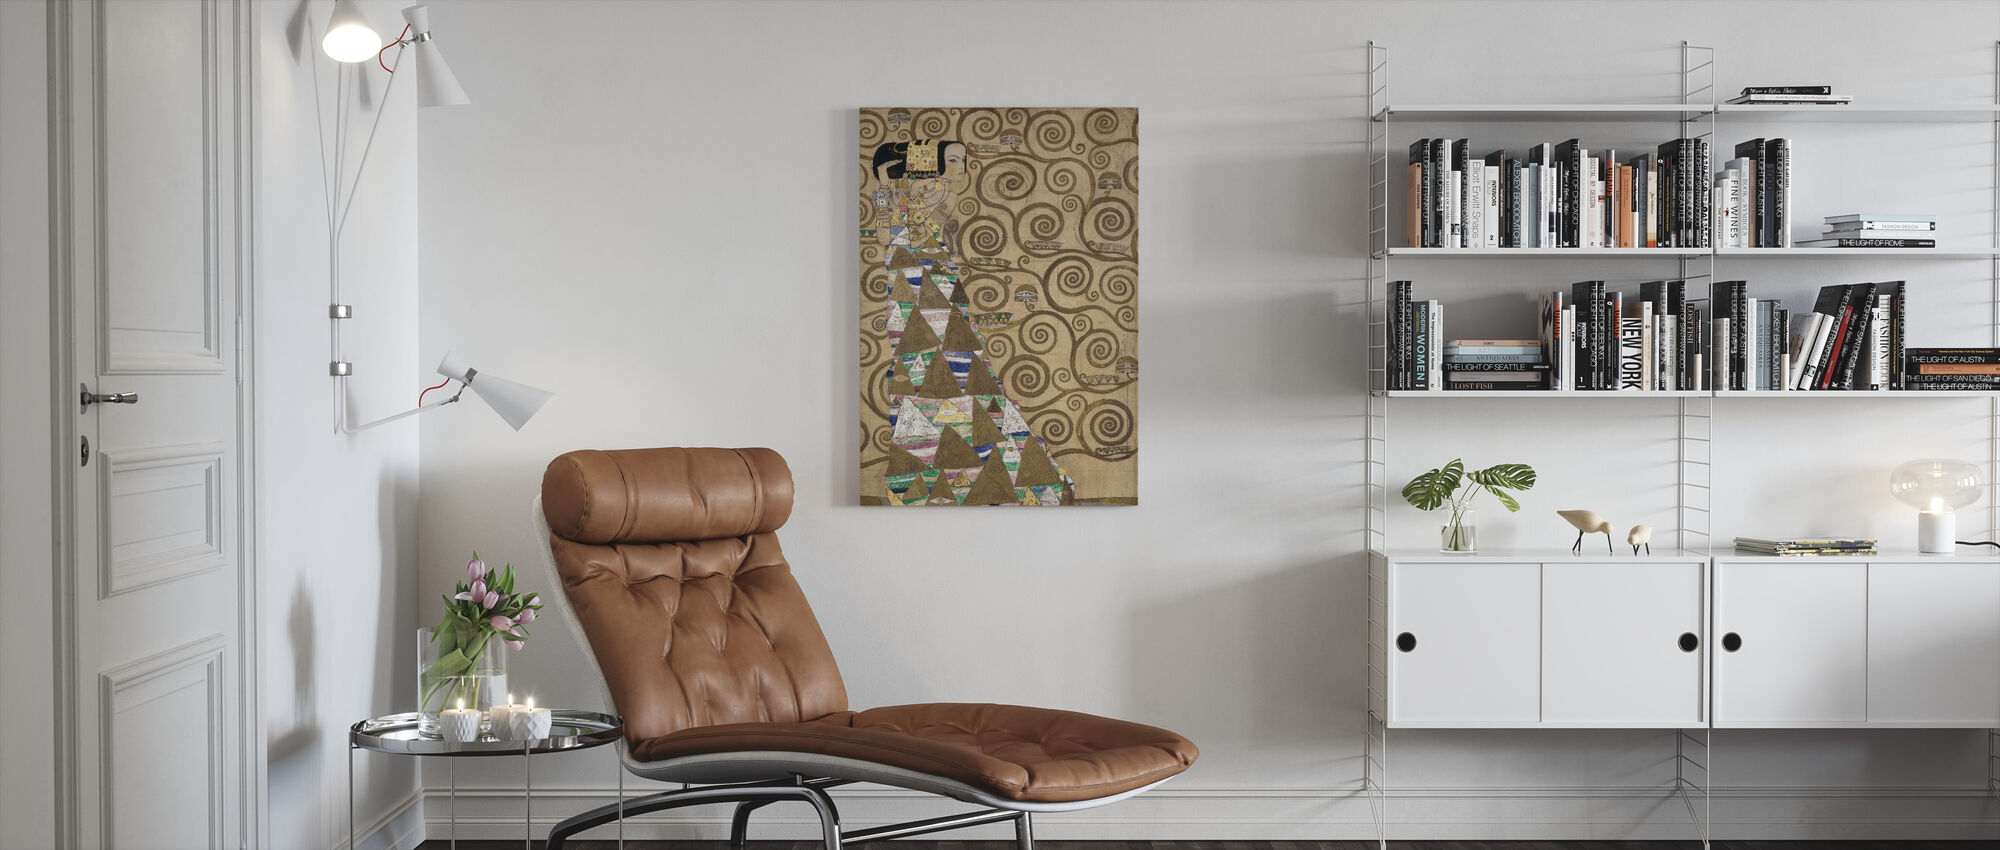 Forventning - Gustav Klimt - Lerretsbilde - Stue